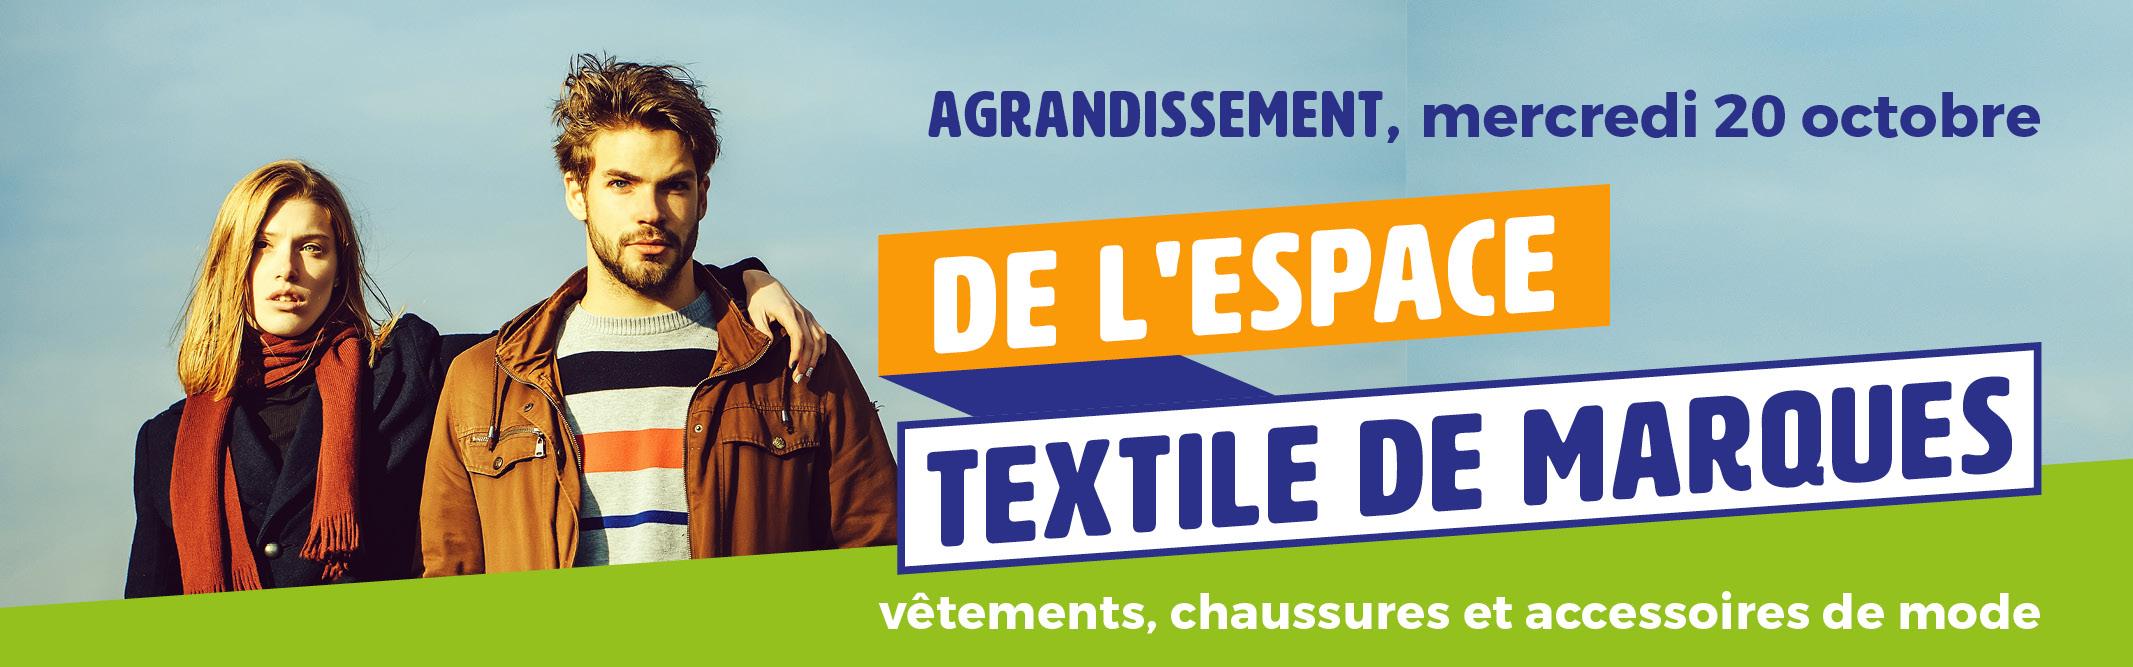 Thouars agr TDM